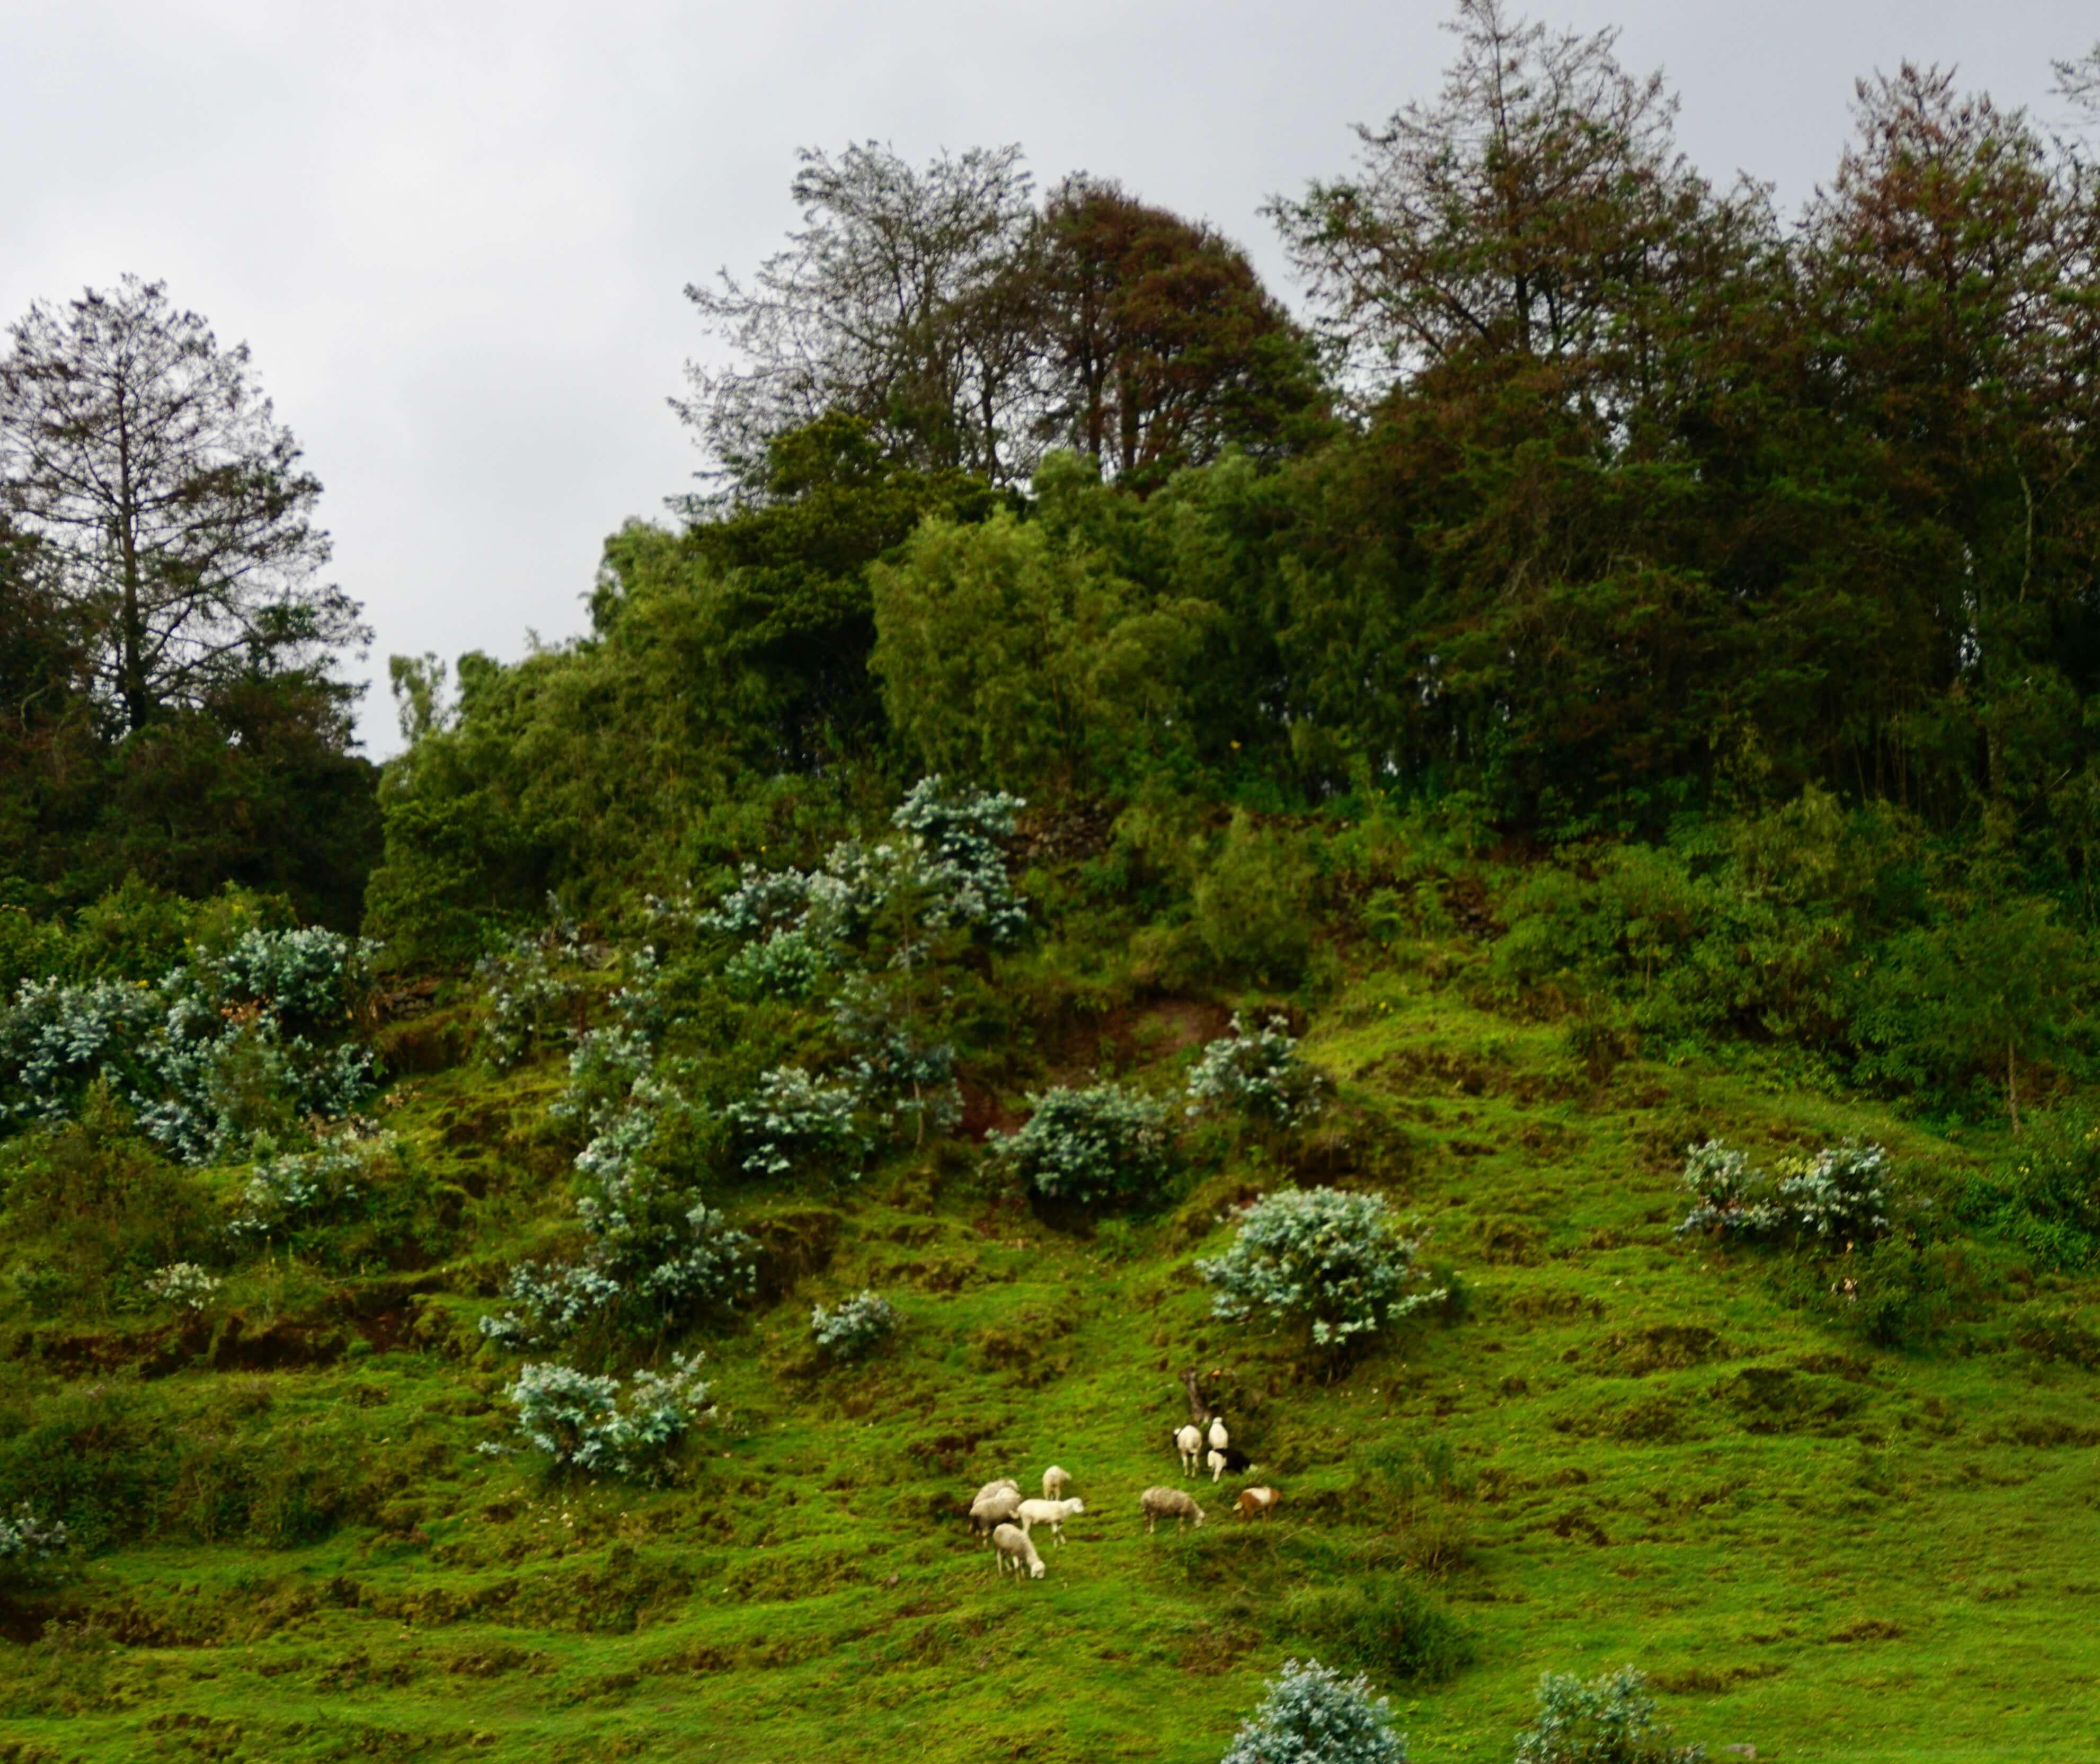 Farmland outside Volcanoes National Park in North Rwanda